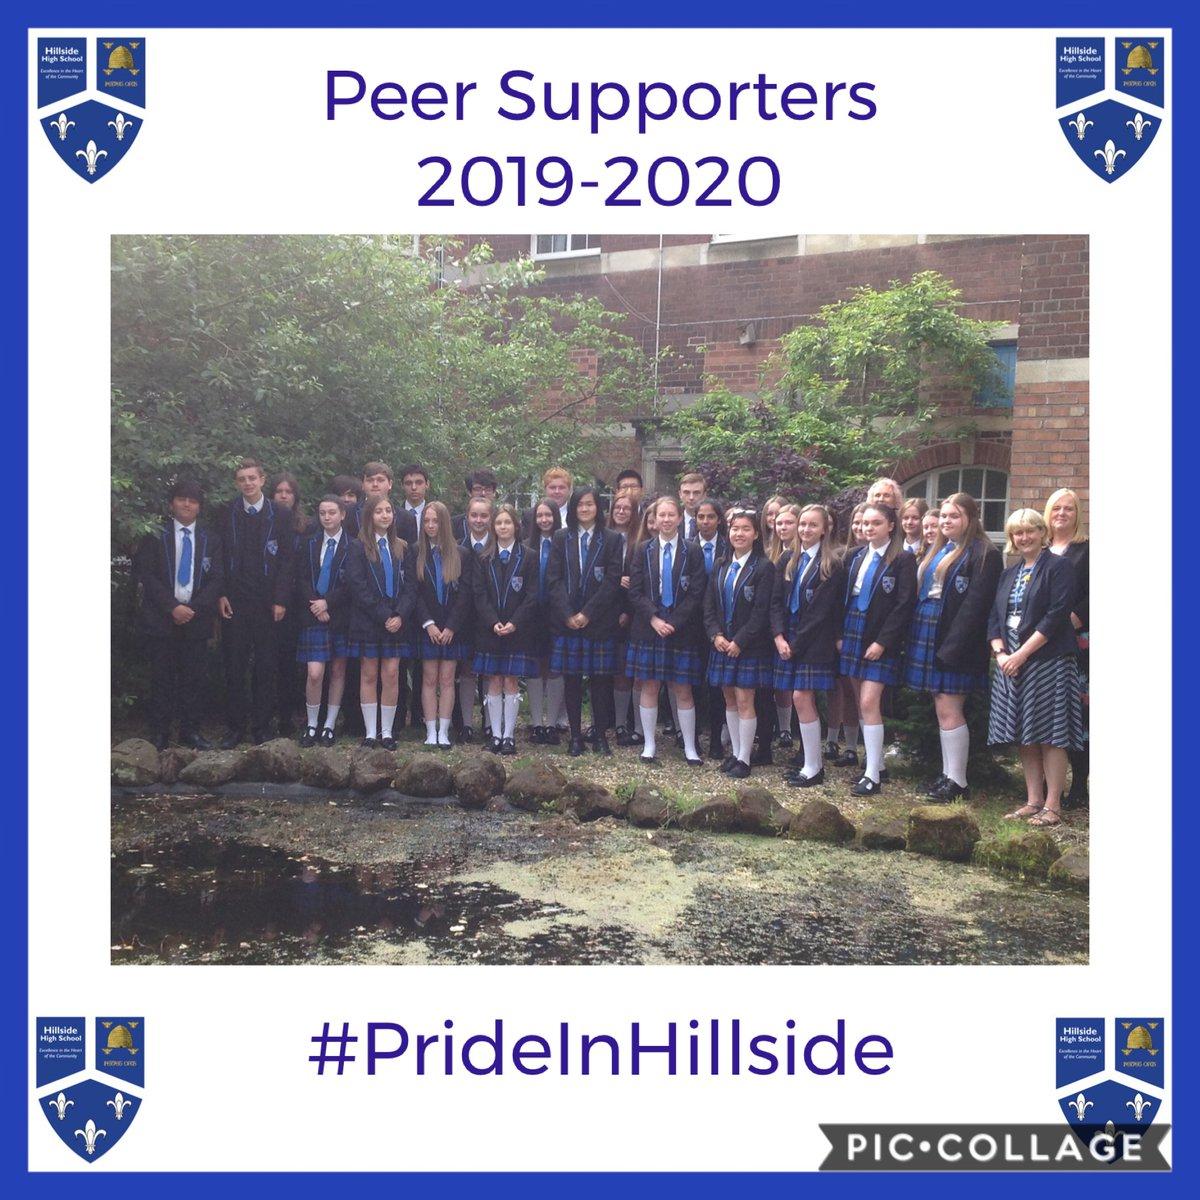 Throwback Thursday  Peer Supporters 2019-2020  #PrideInHillside #ThrowbackThursday  #MissYou pic.twitter.com/vz73AIahsU